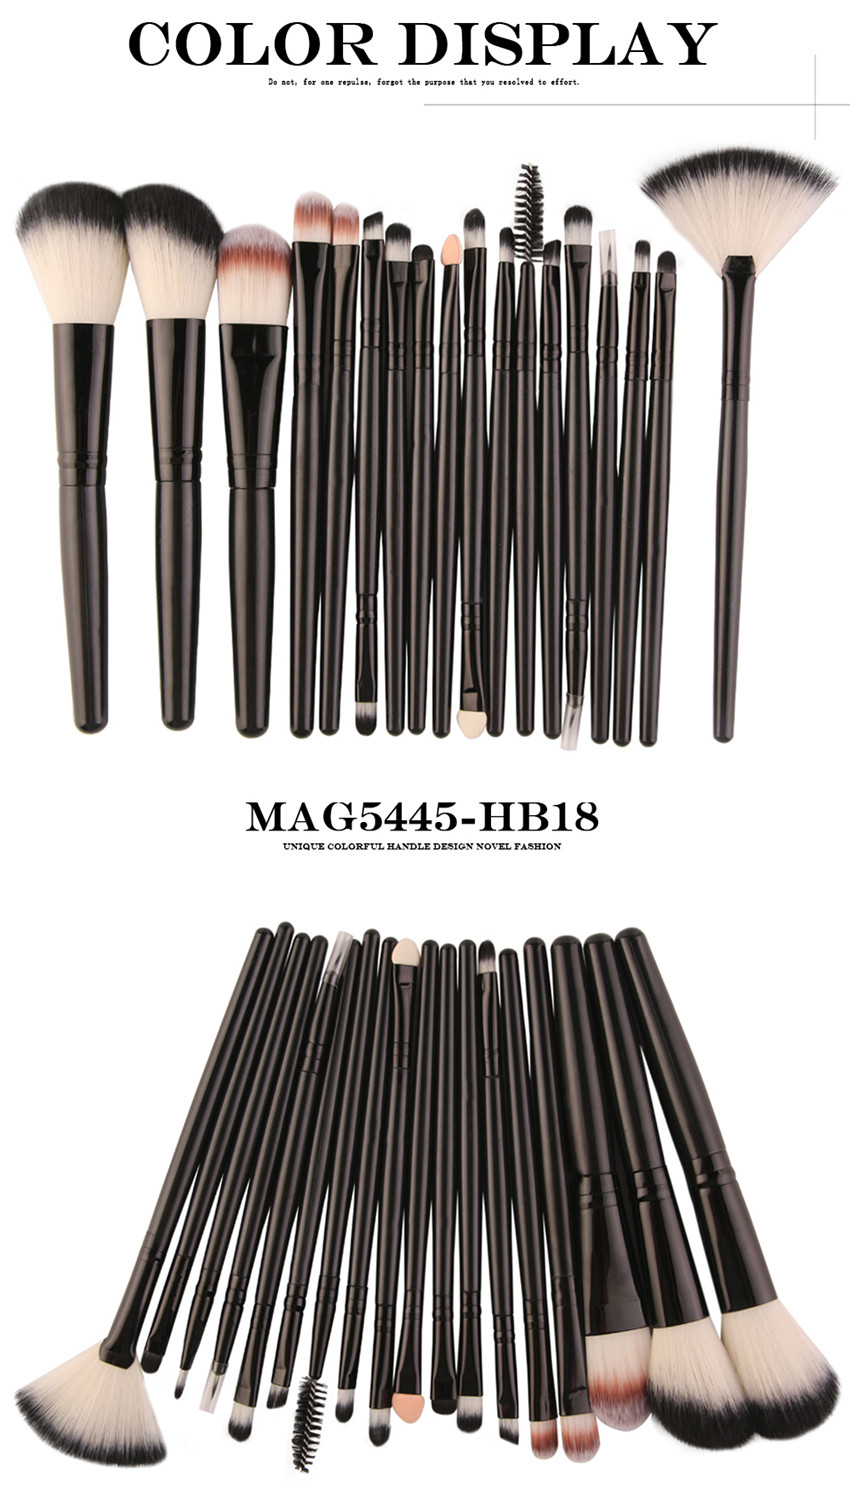 18Pcs/lot Brand Brushes Makeup Brush Set maquiagem Cosmetics Power Foundation Blush Eye Shadow Blending Fan Make Up Kits Beauty 10